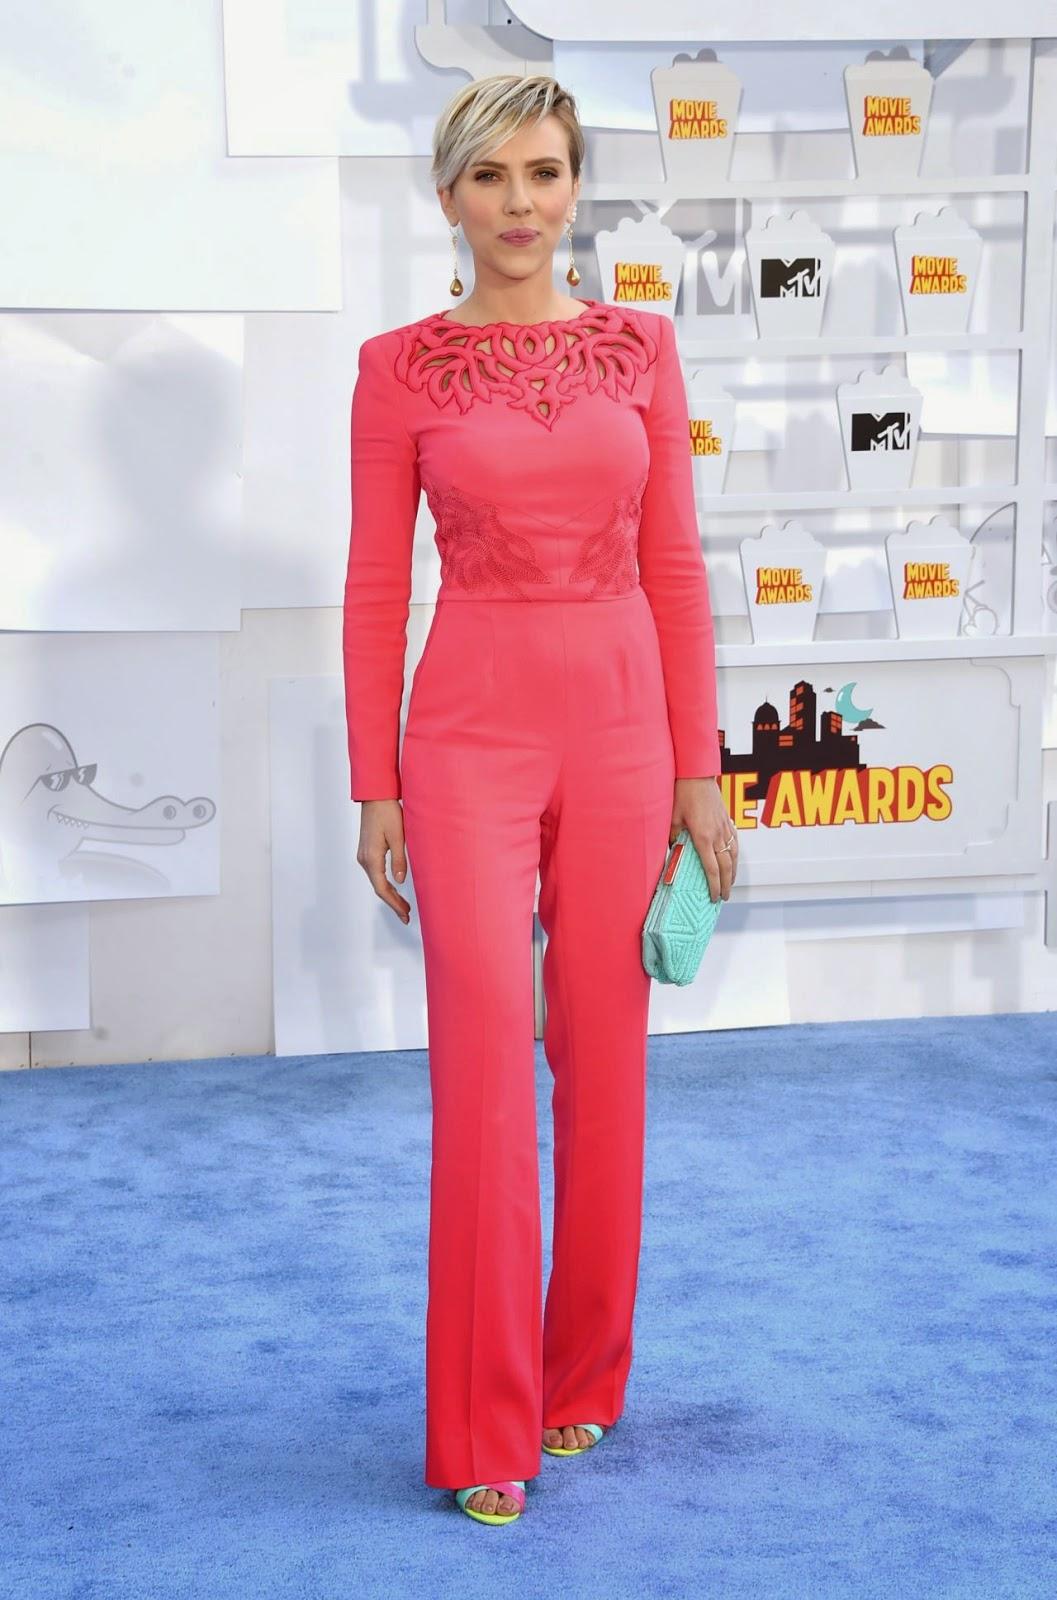 Scarlett Johansson wears a Zuhair Murad jumpsuit to the 2015 MTV Movie Awards